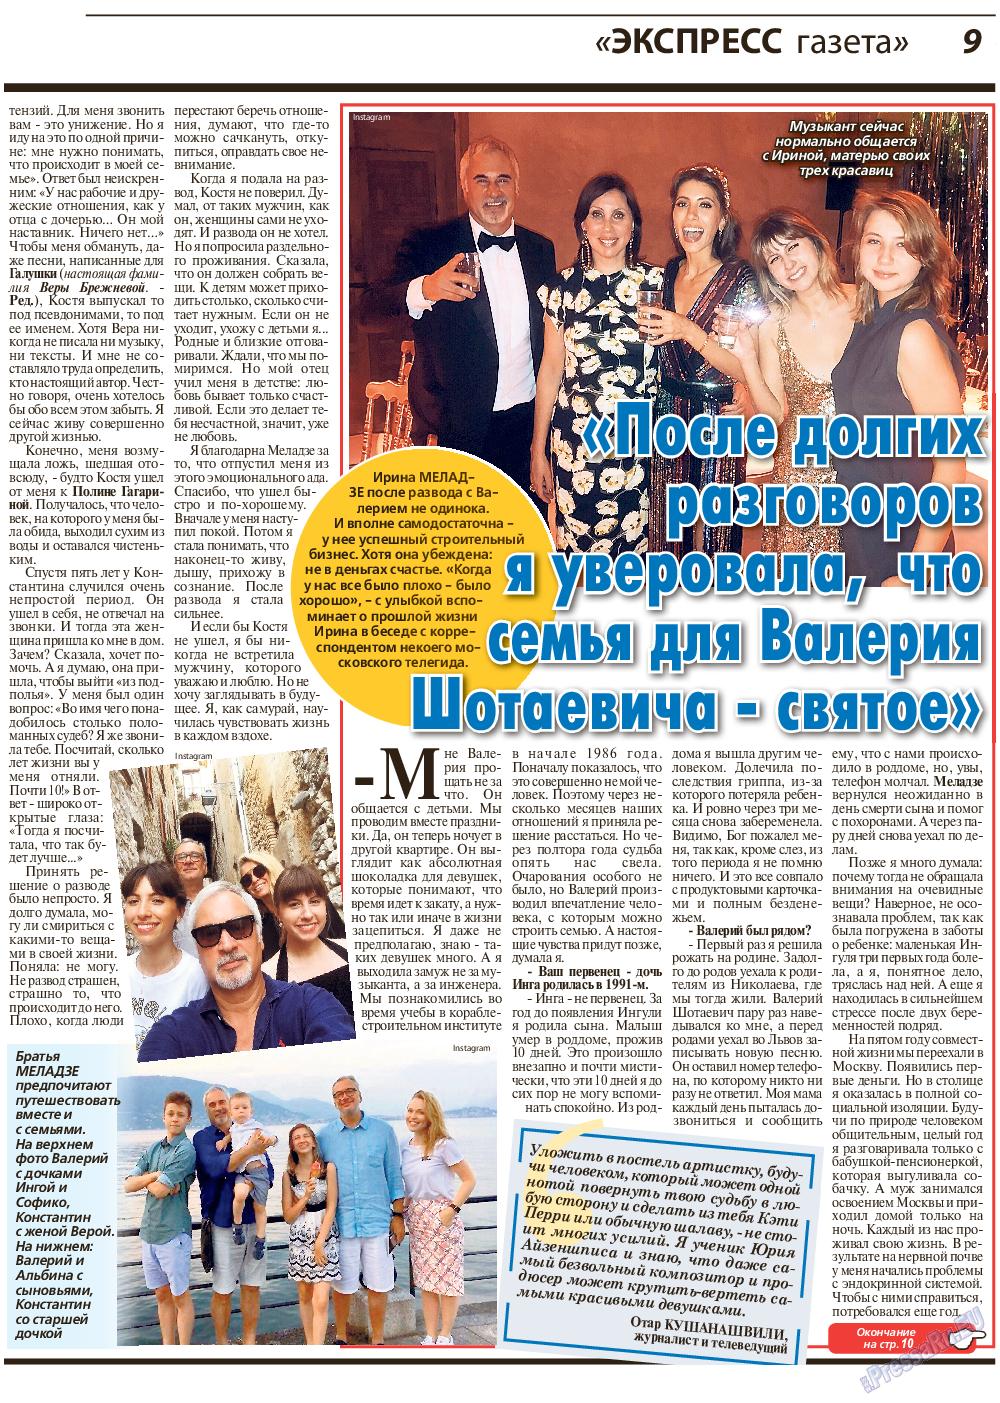 Экспресс газета (газета). 2018 год, номер 6, стр. 9